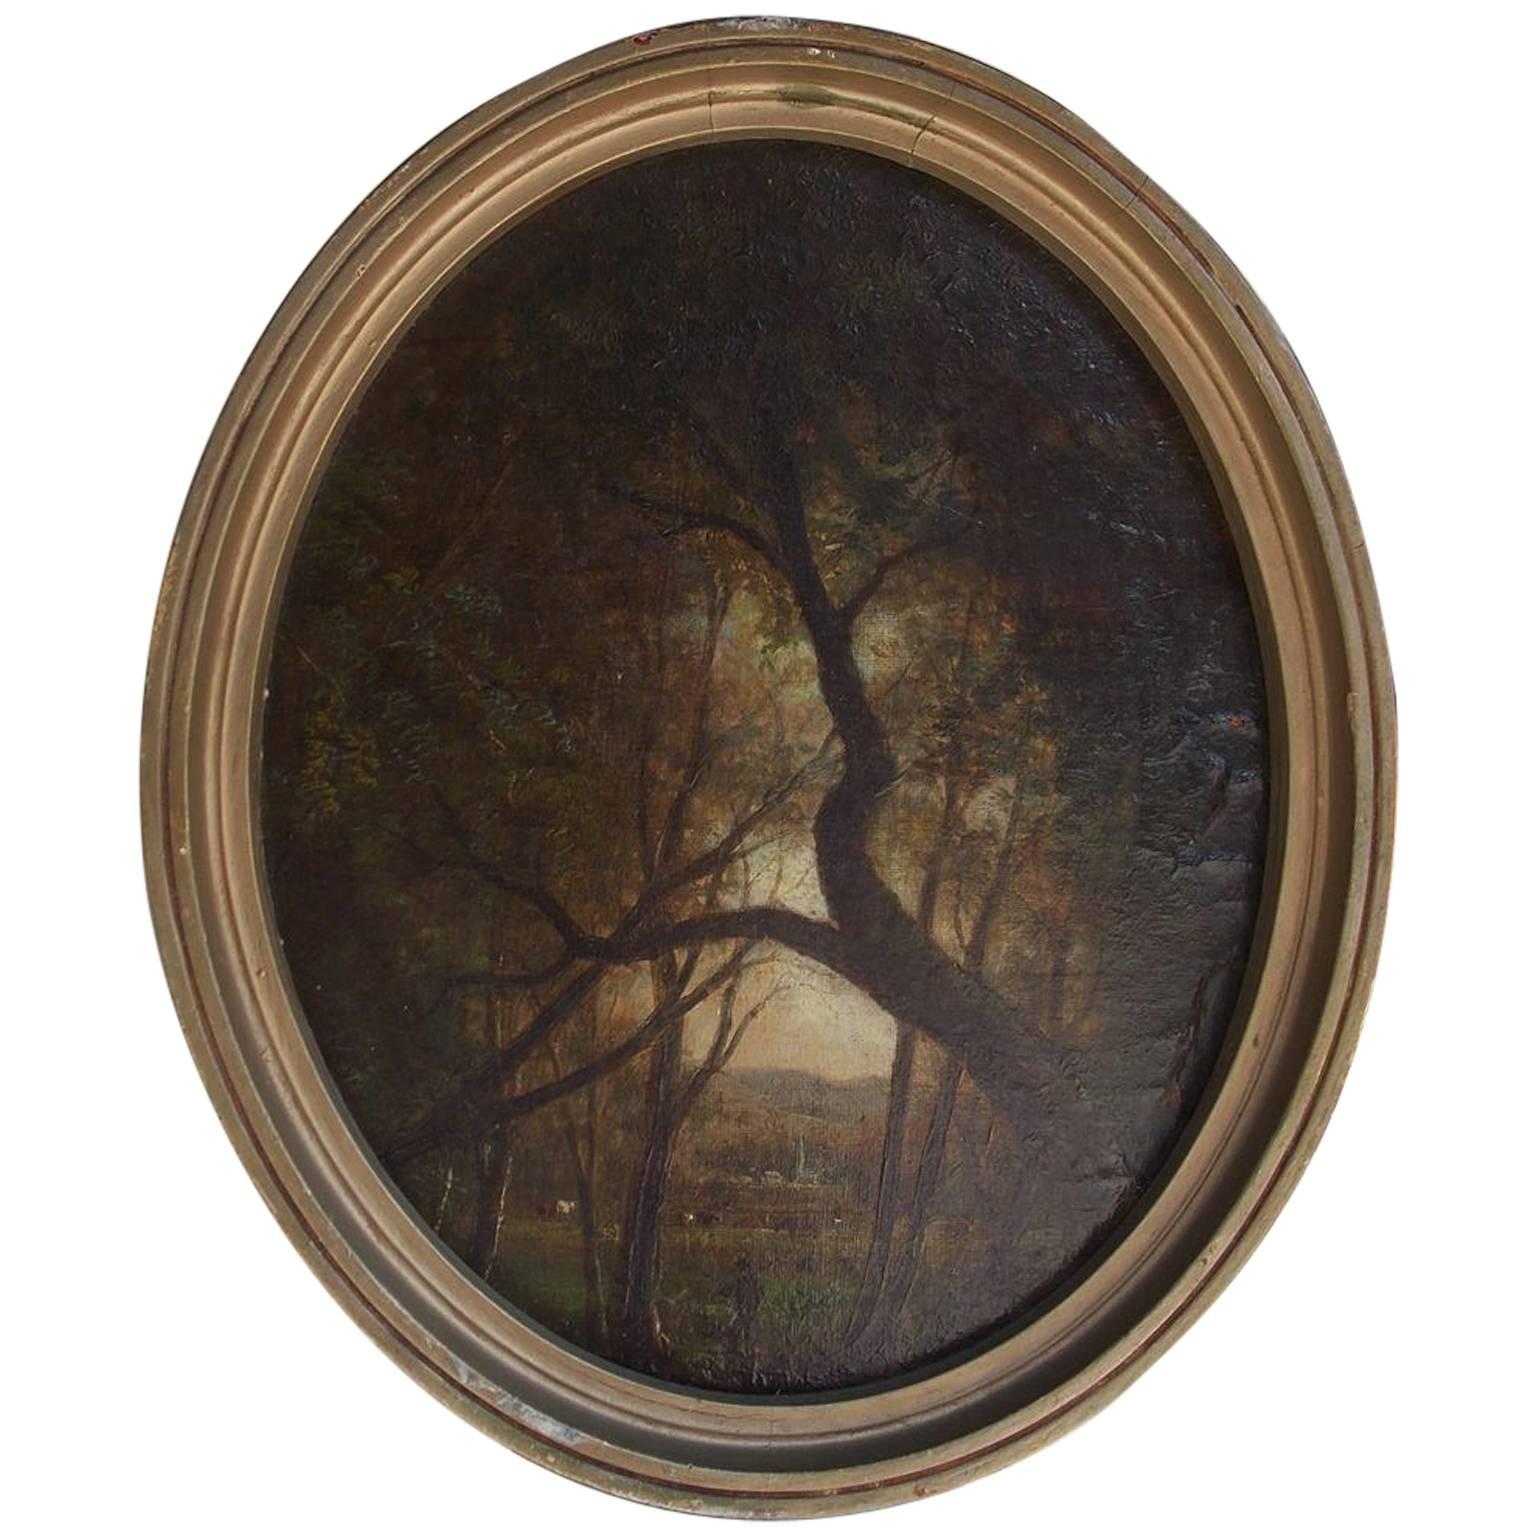 American Diminutive Oval Oil on Canvas Landscape, Circa 1870